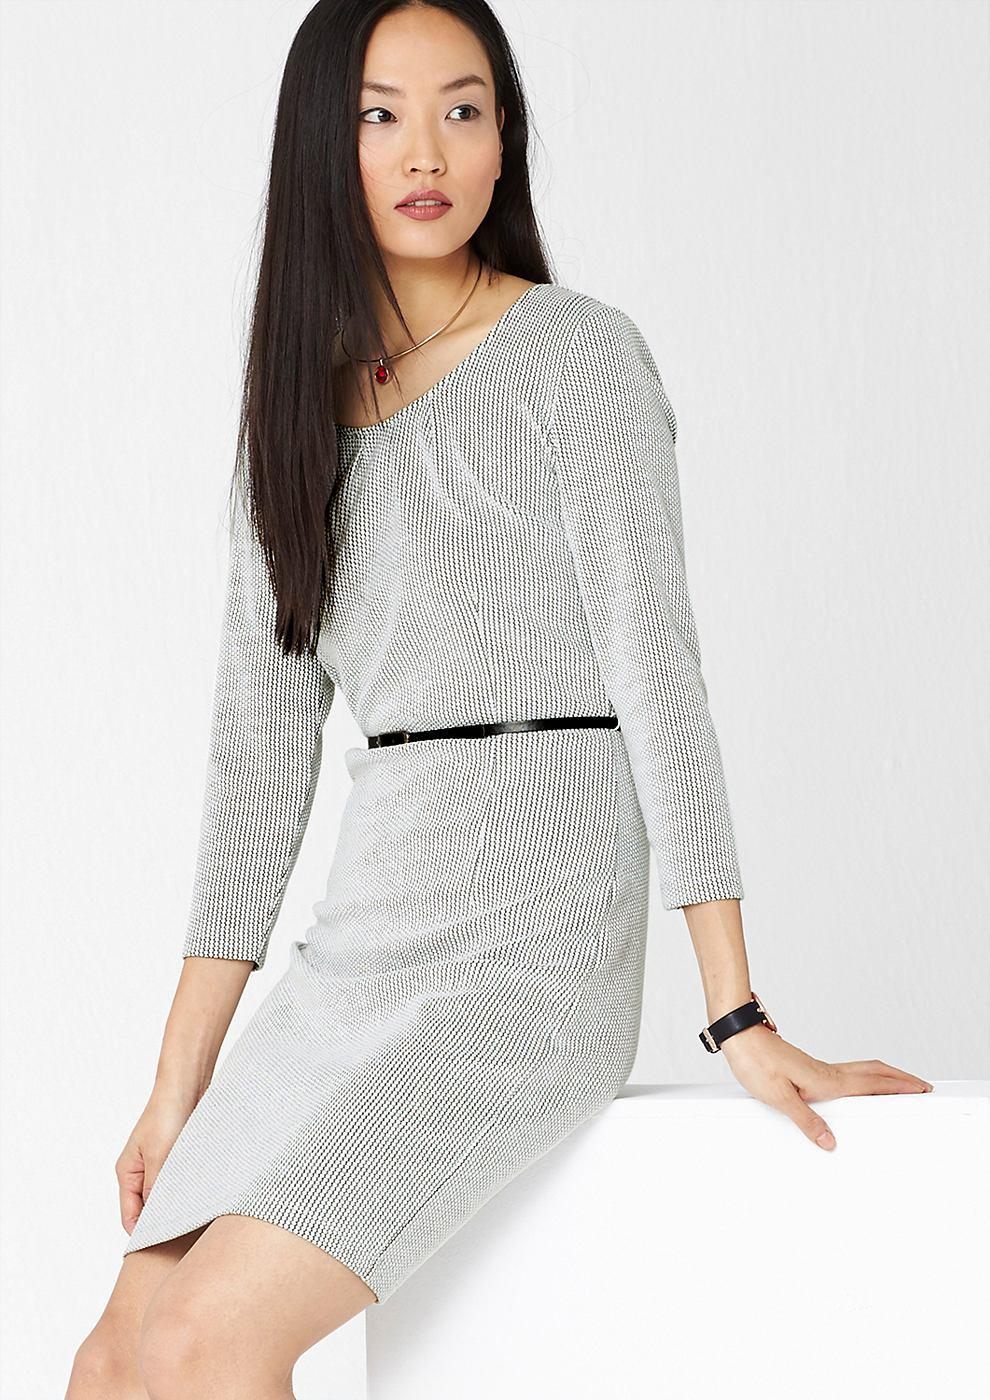 s.Oliver Premium Jacquard jurk met riem wit